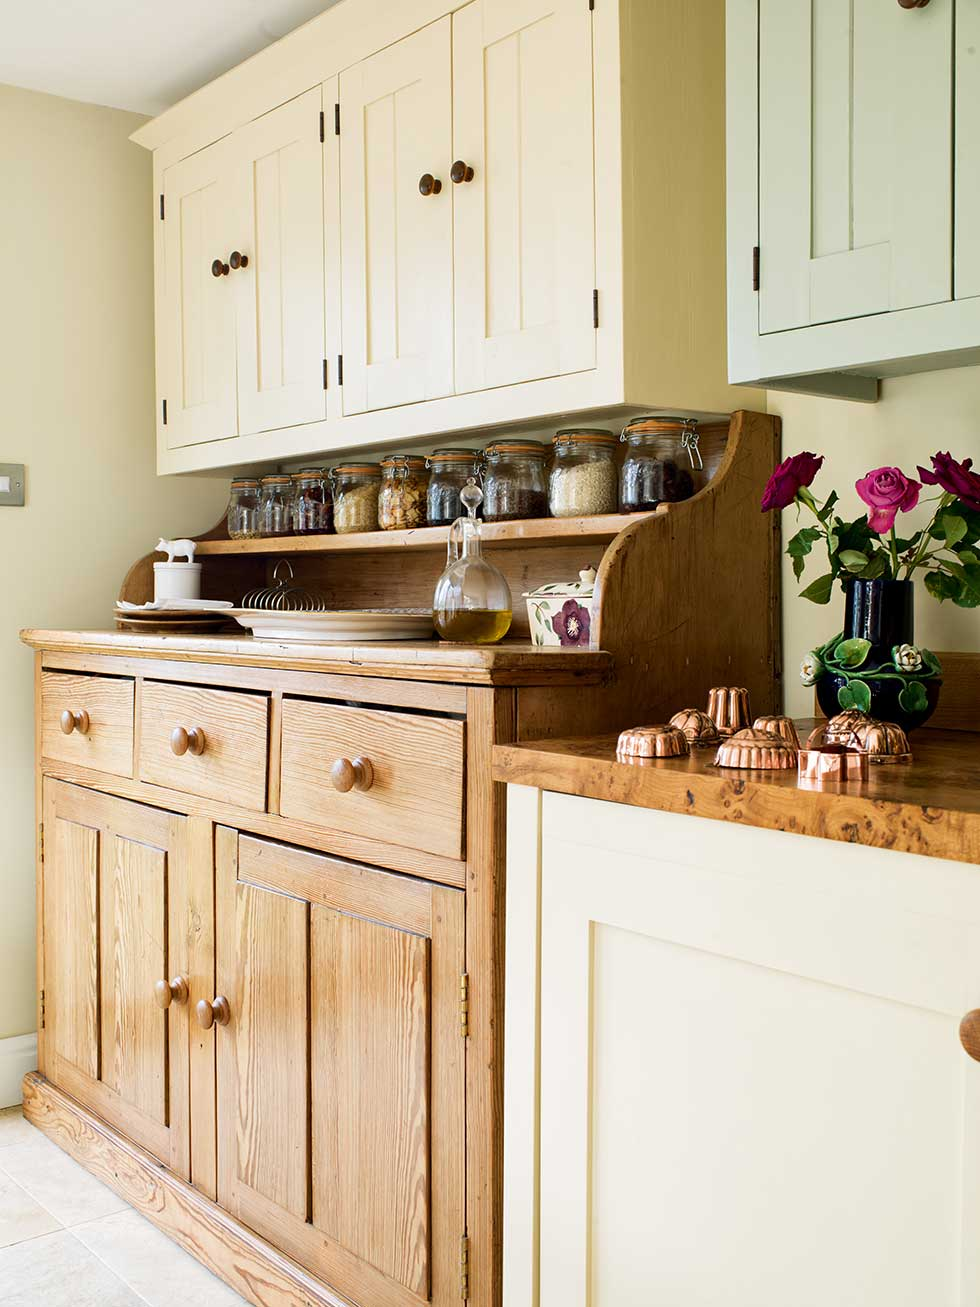 rush-kitchen-cabinets